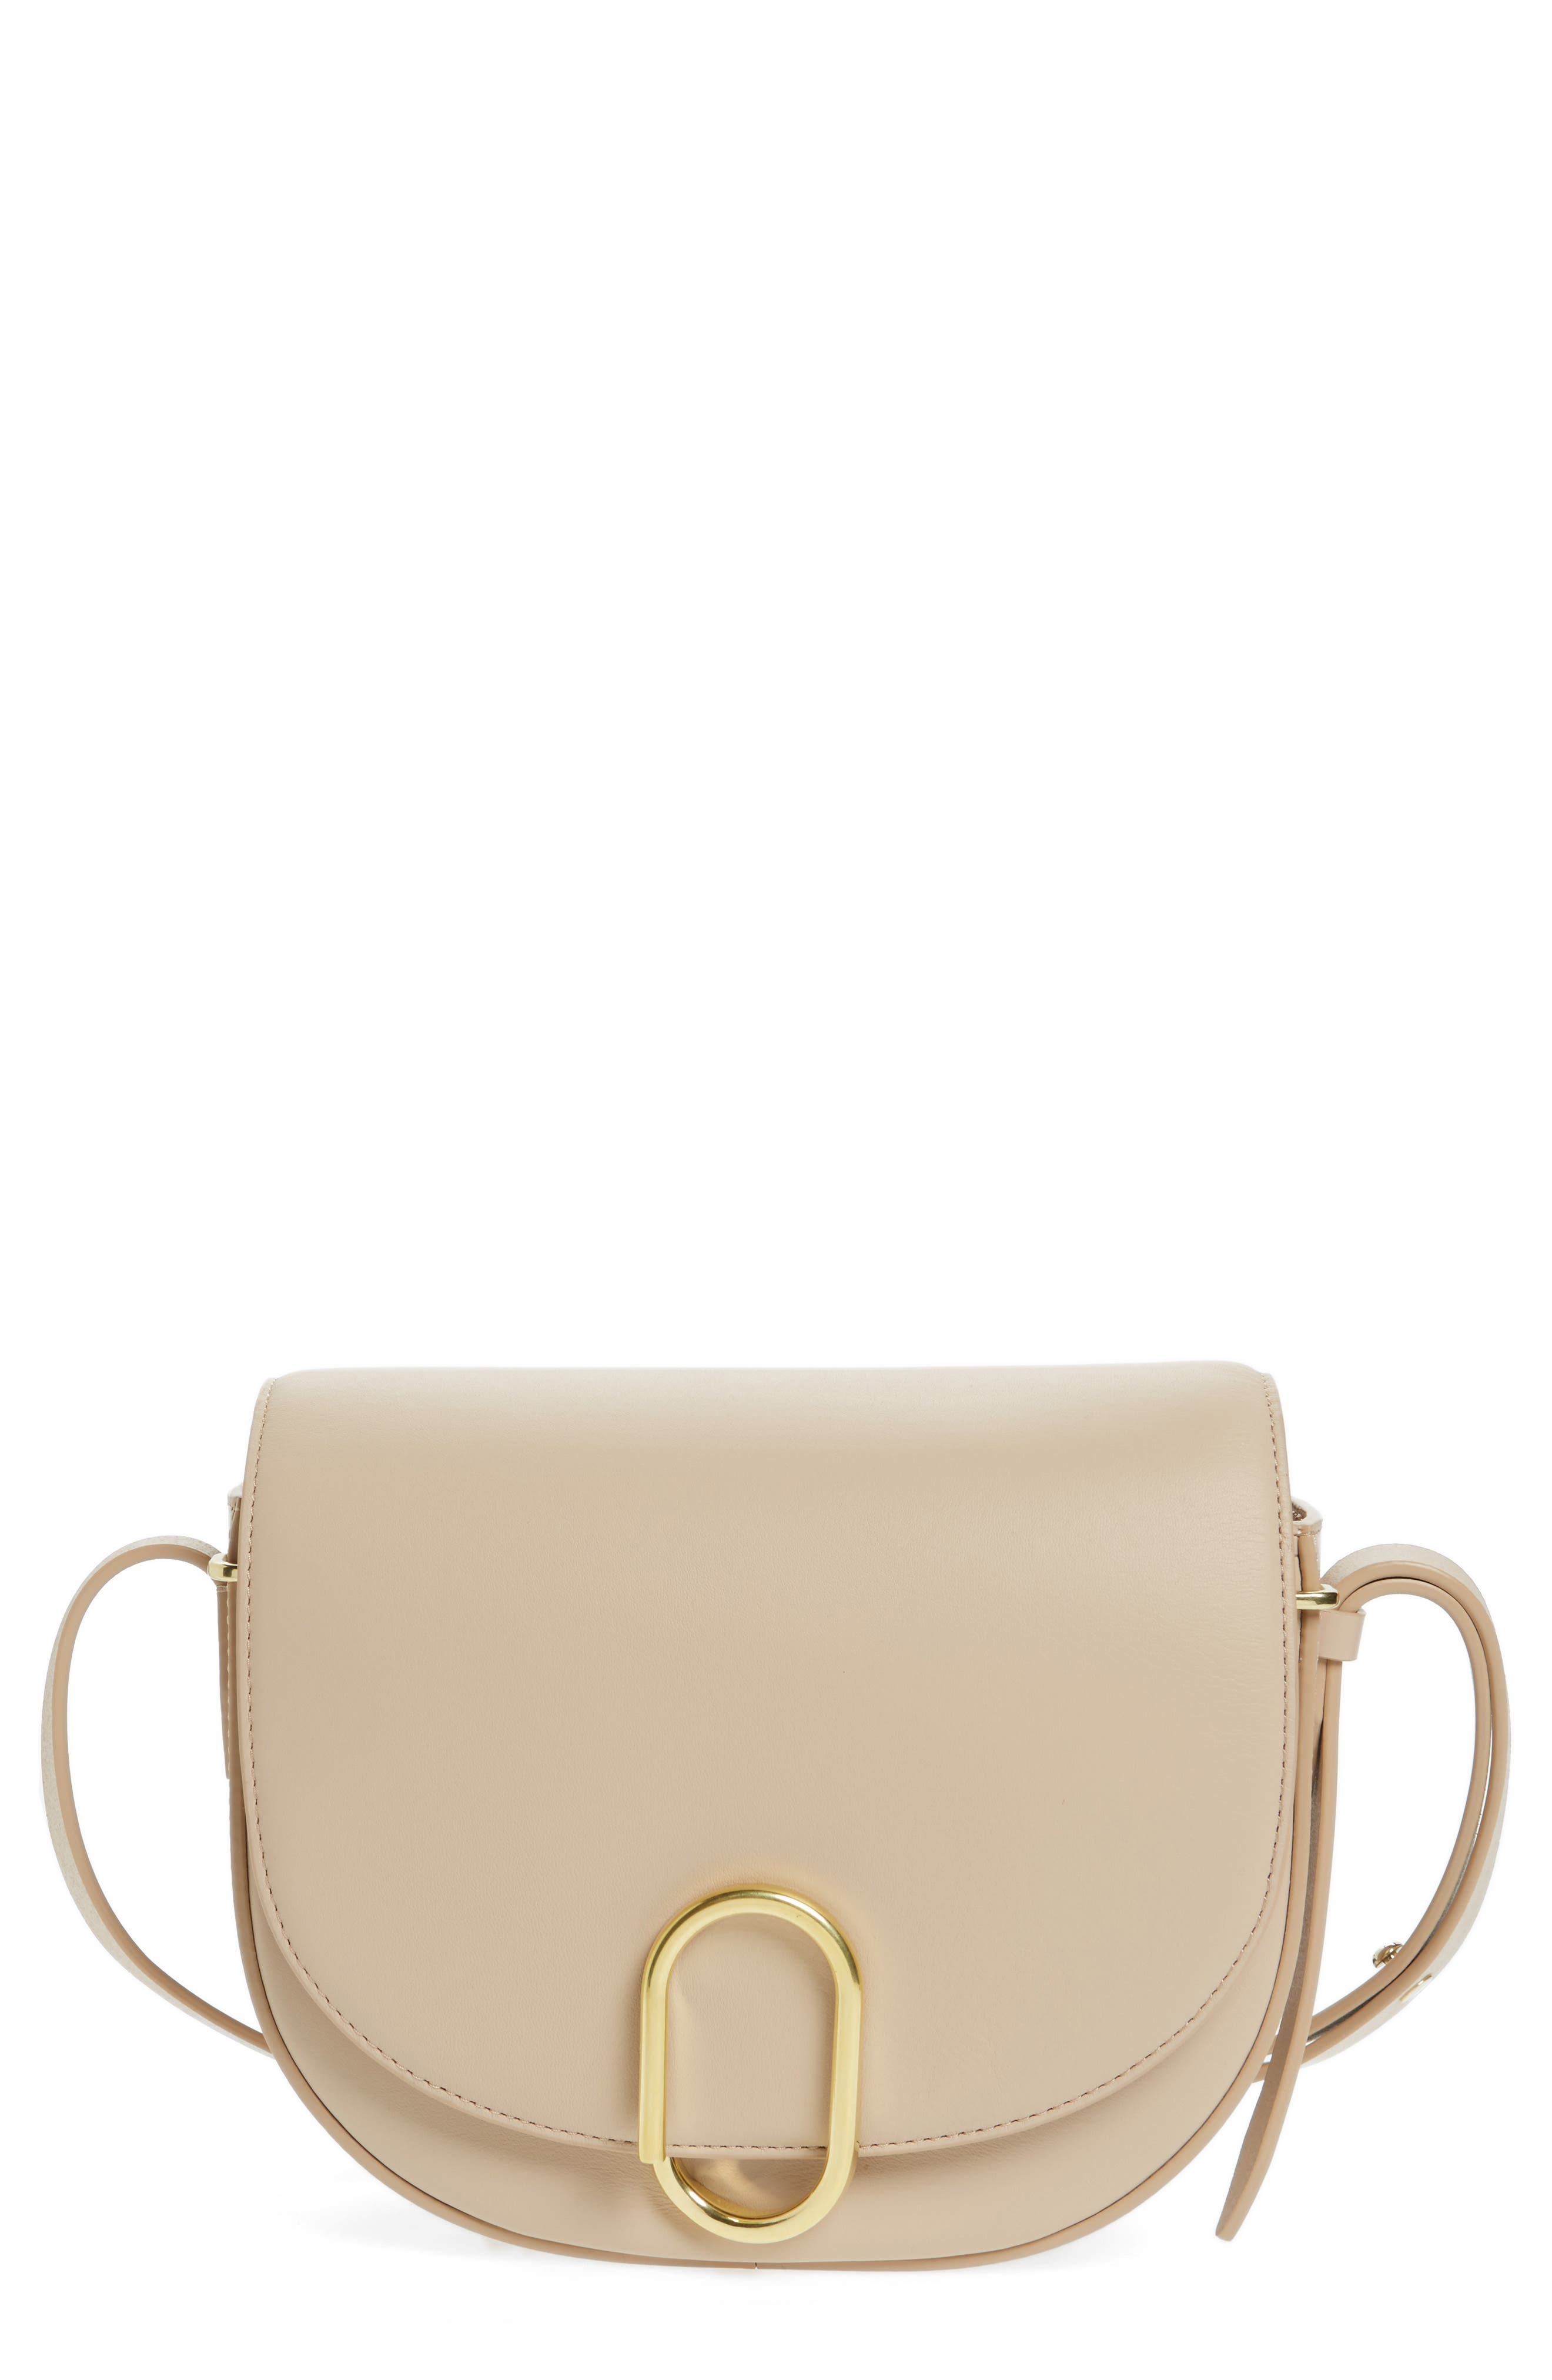 Alix Leather Saddle Bag,                         Main,                         color, 260